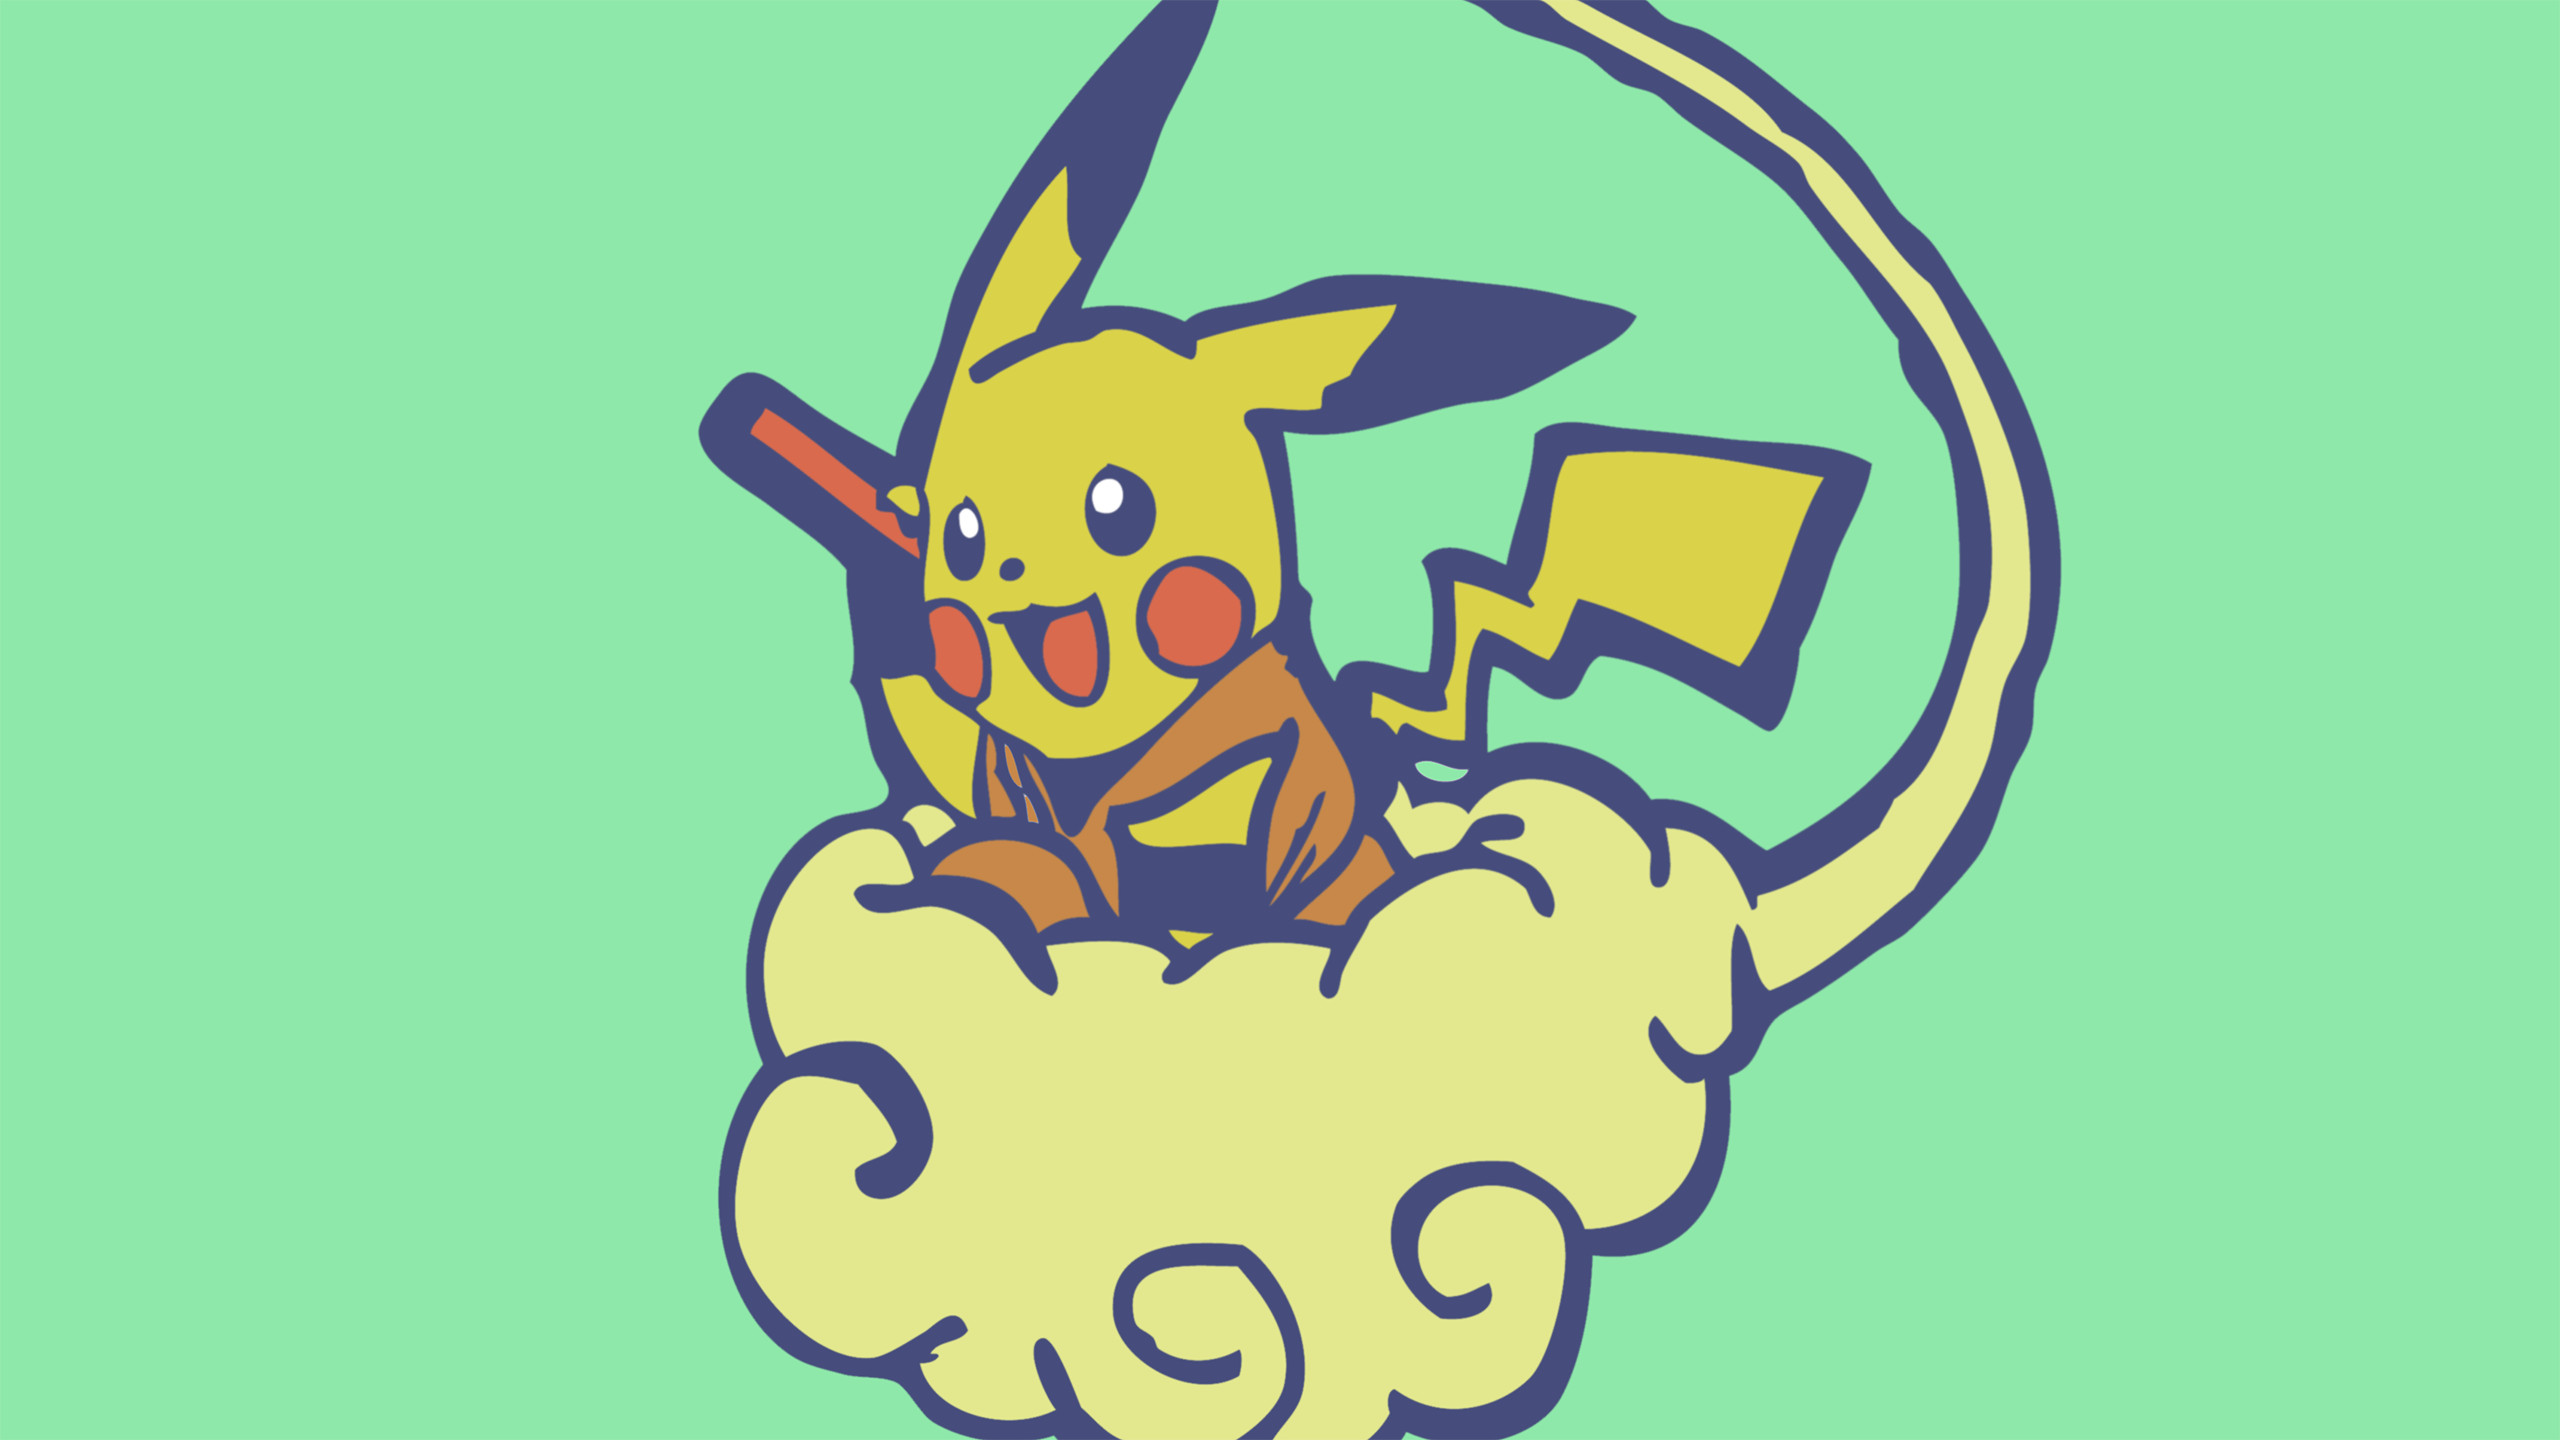 Anime РCrossover Pikachu Dragon Ball Z Pok̩mon Wallpaper